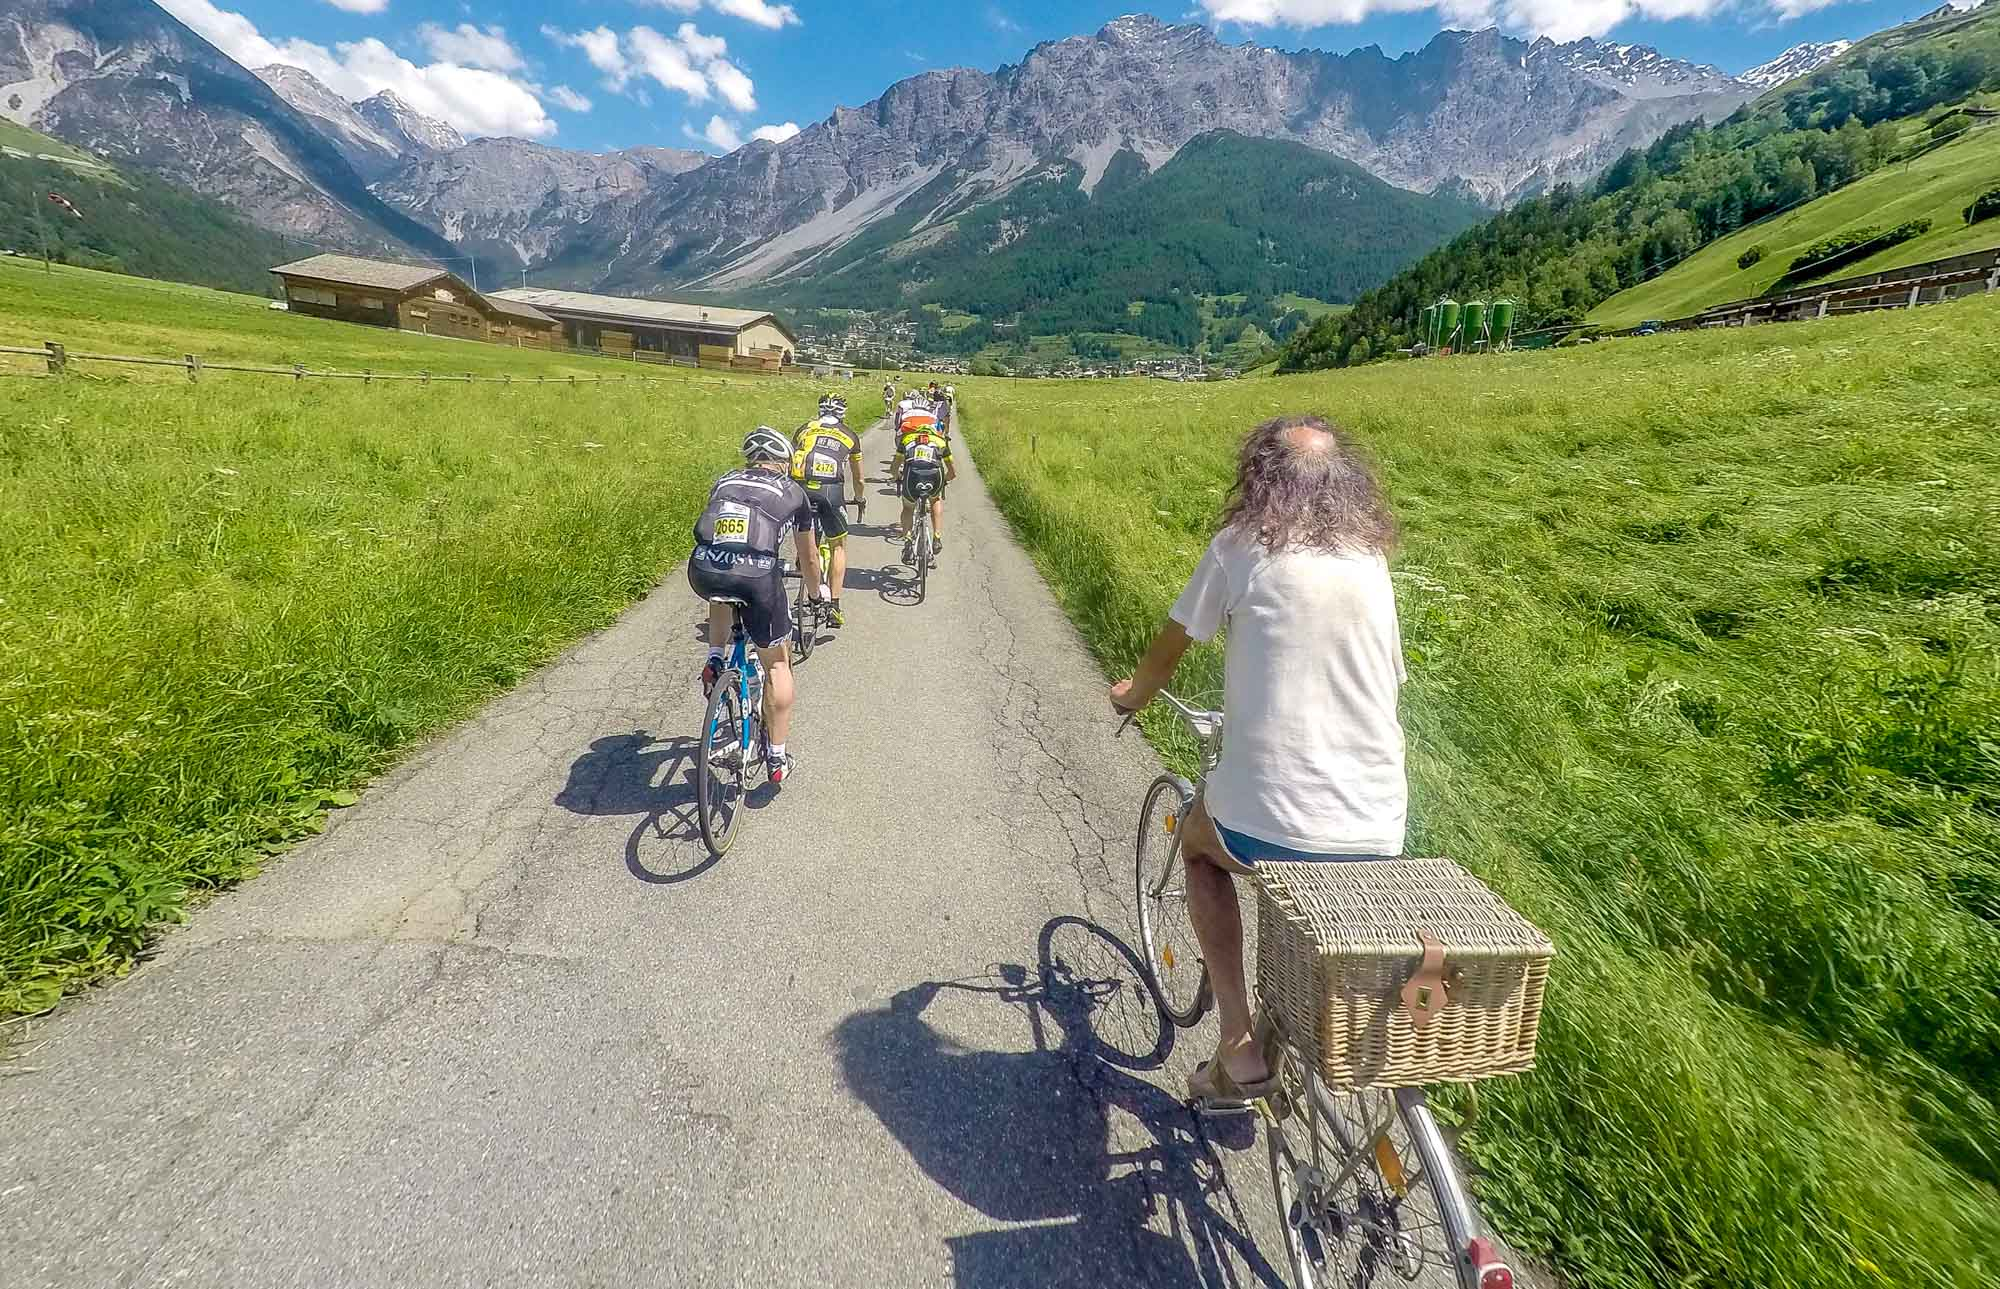 łysy koleś na rowerze